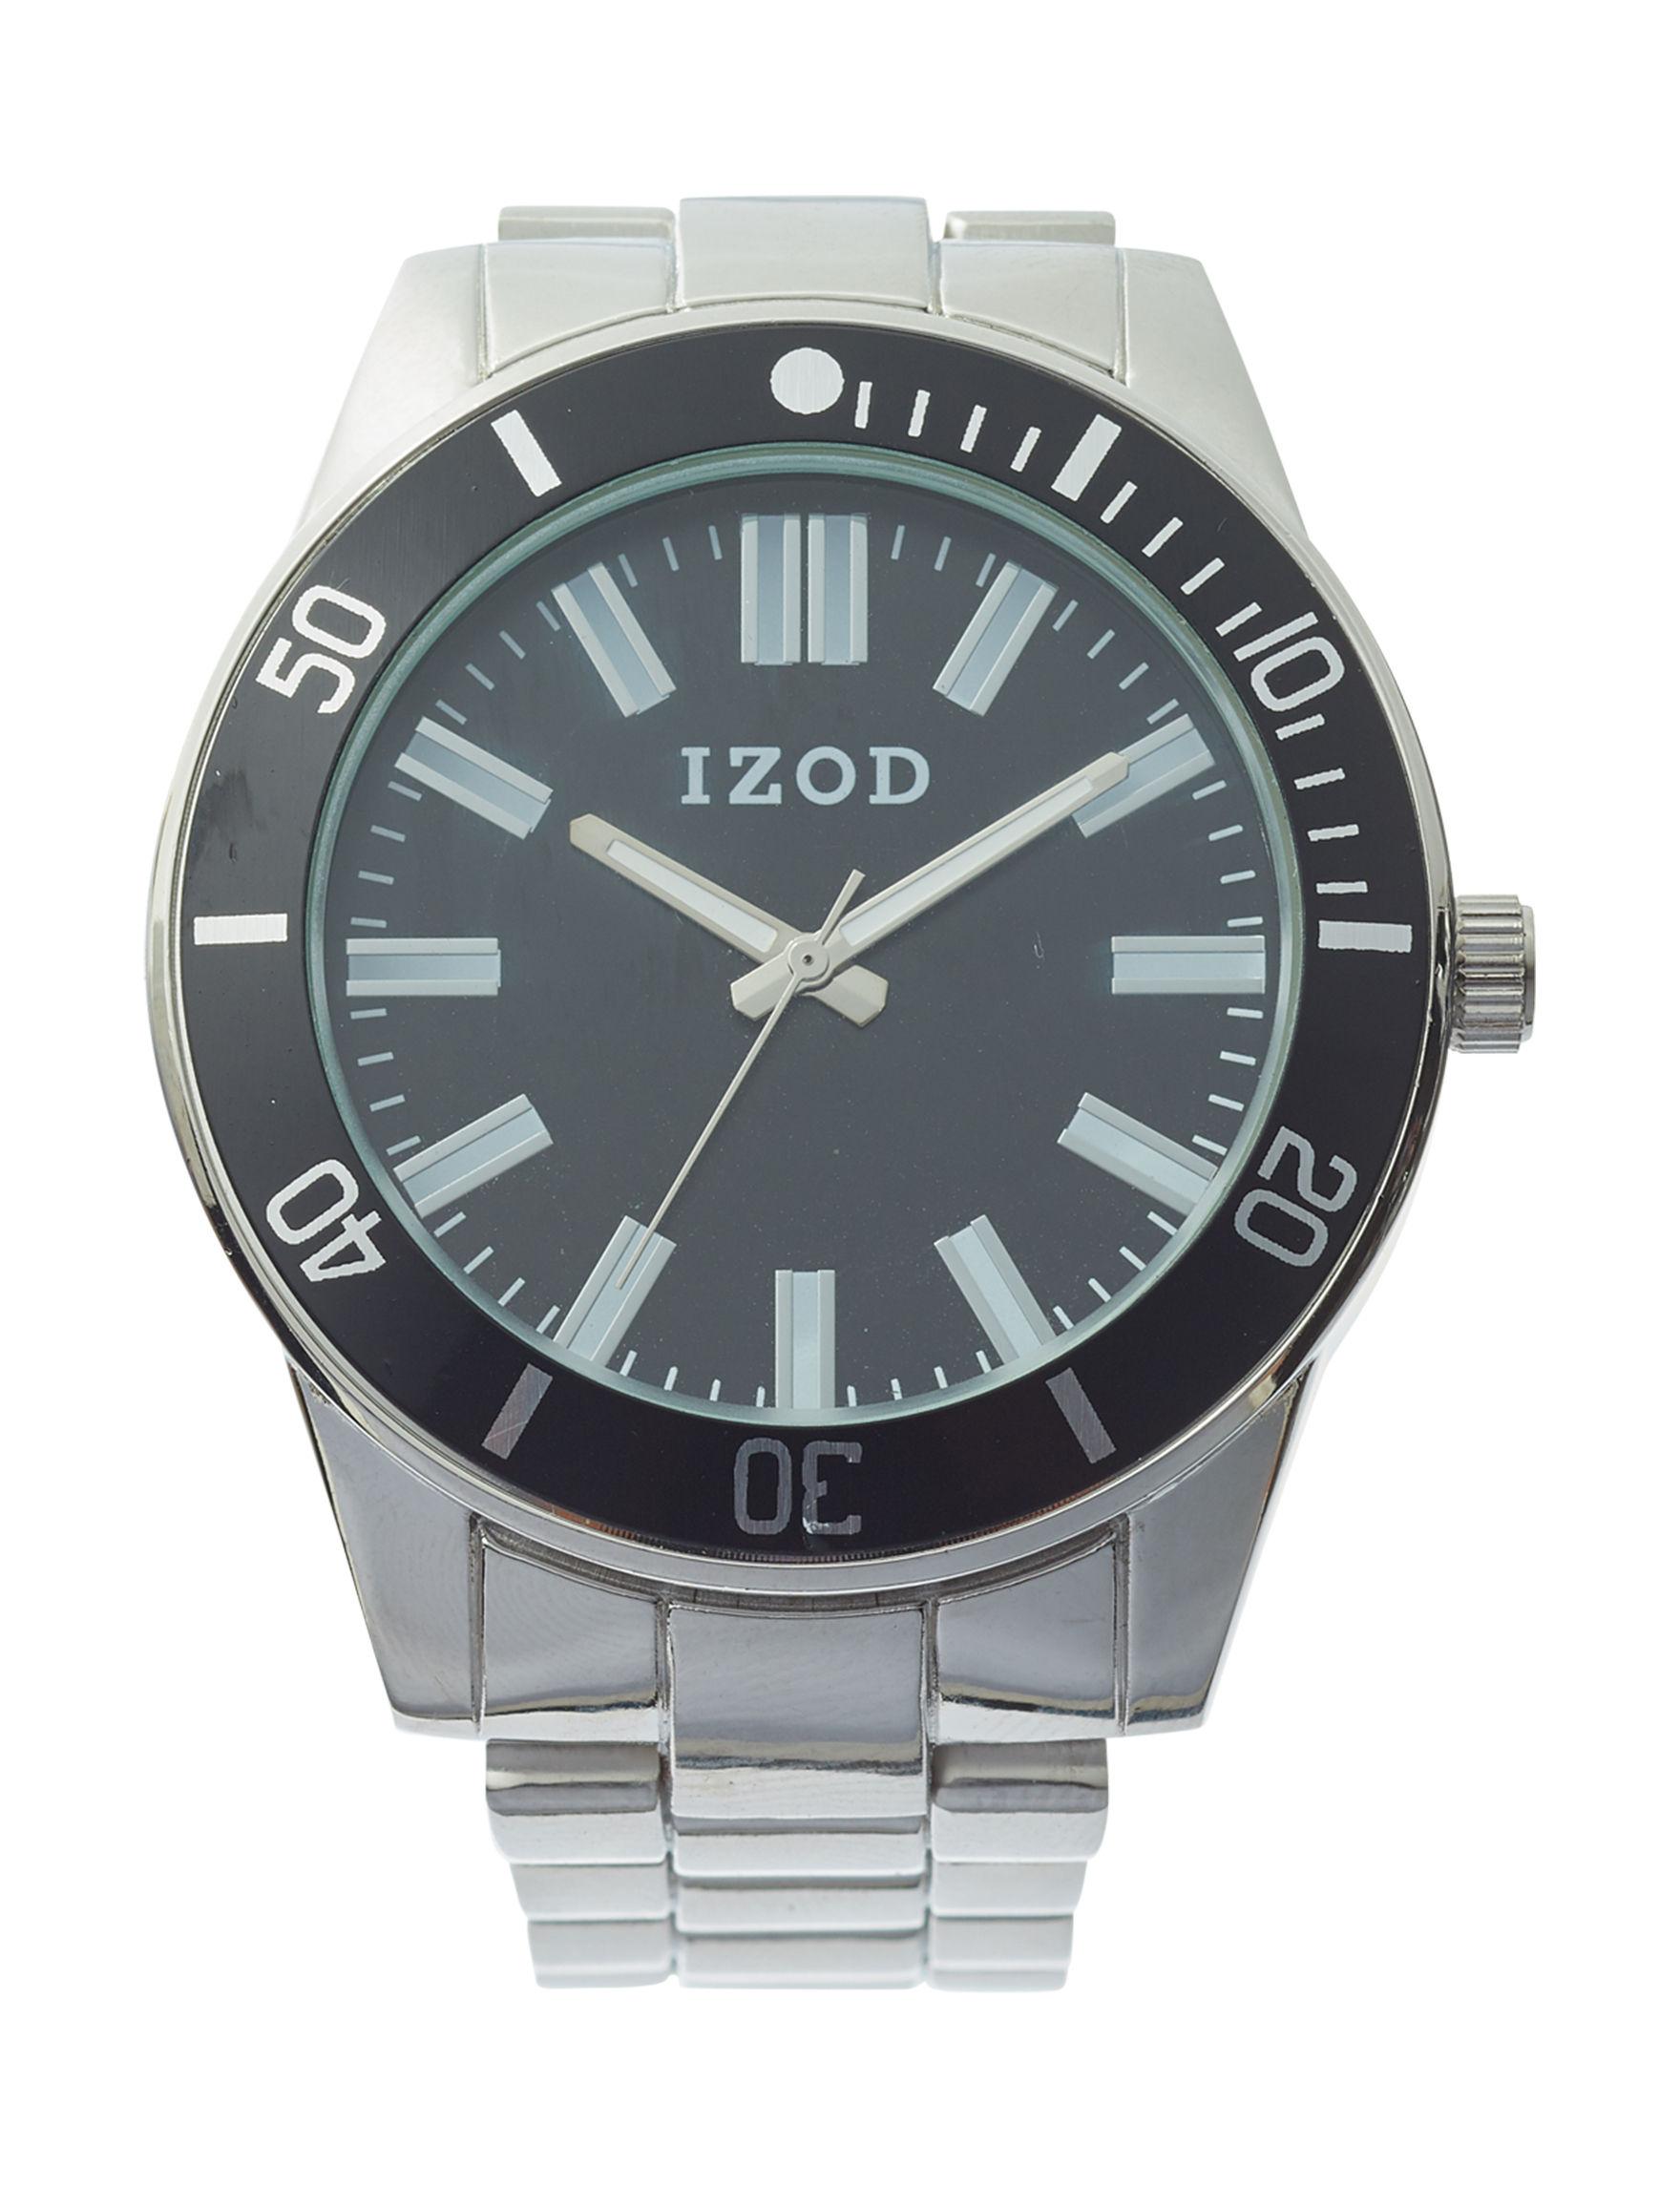 Izod Silver Fashion Watches